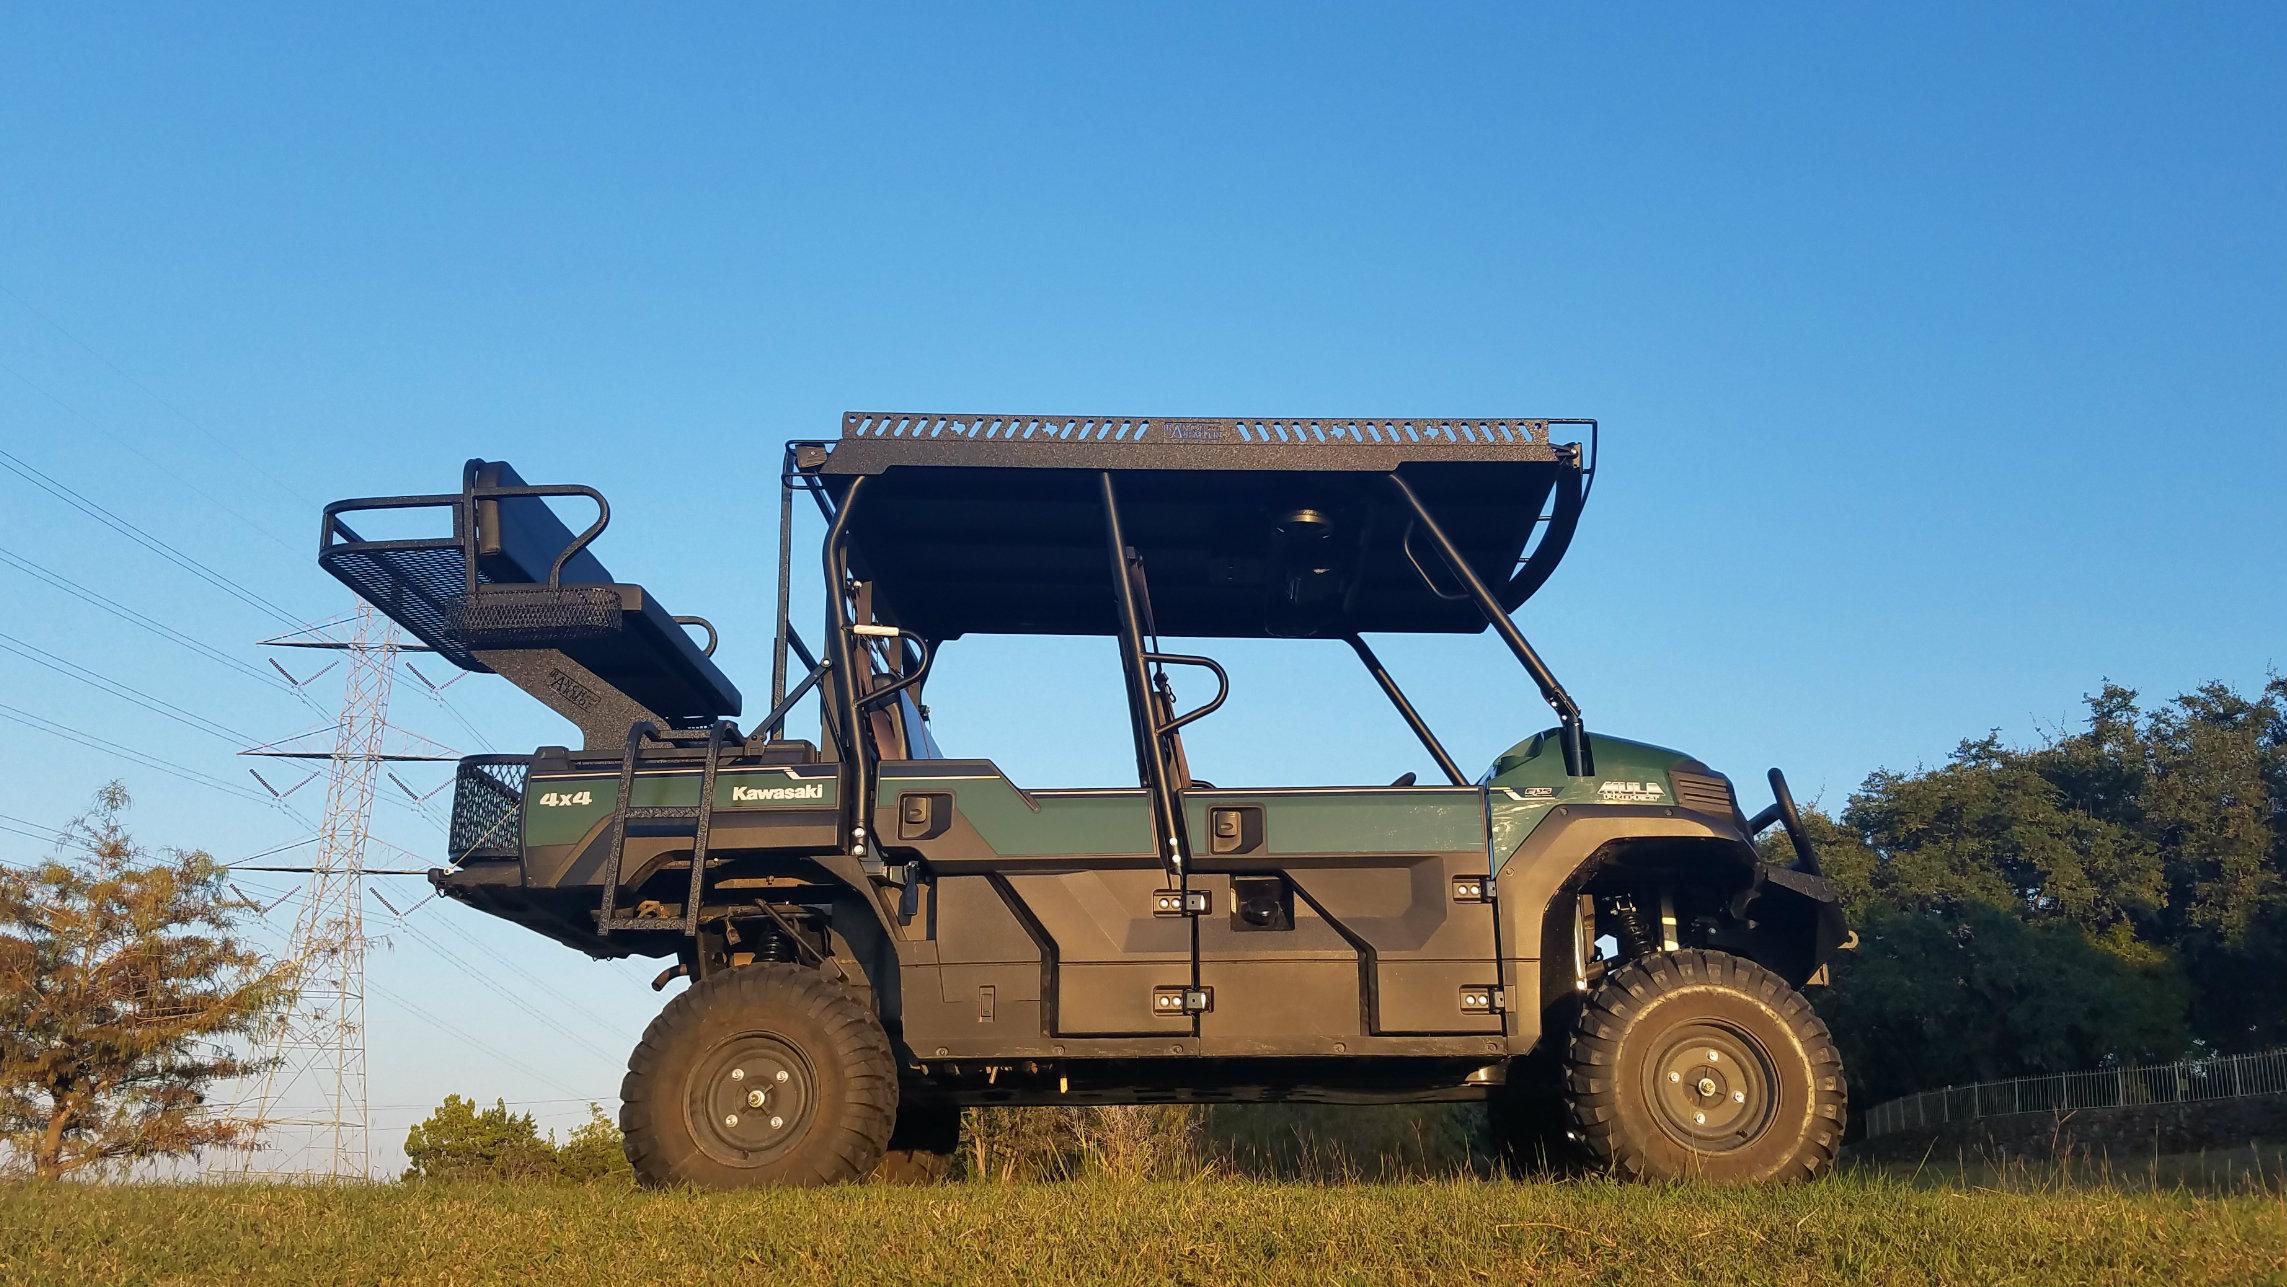 Rhino Liner Cost >> Kawasaki Mule Pro FXT High Seat - Texas Outdoors